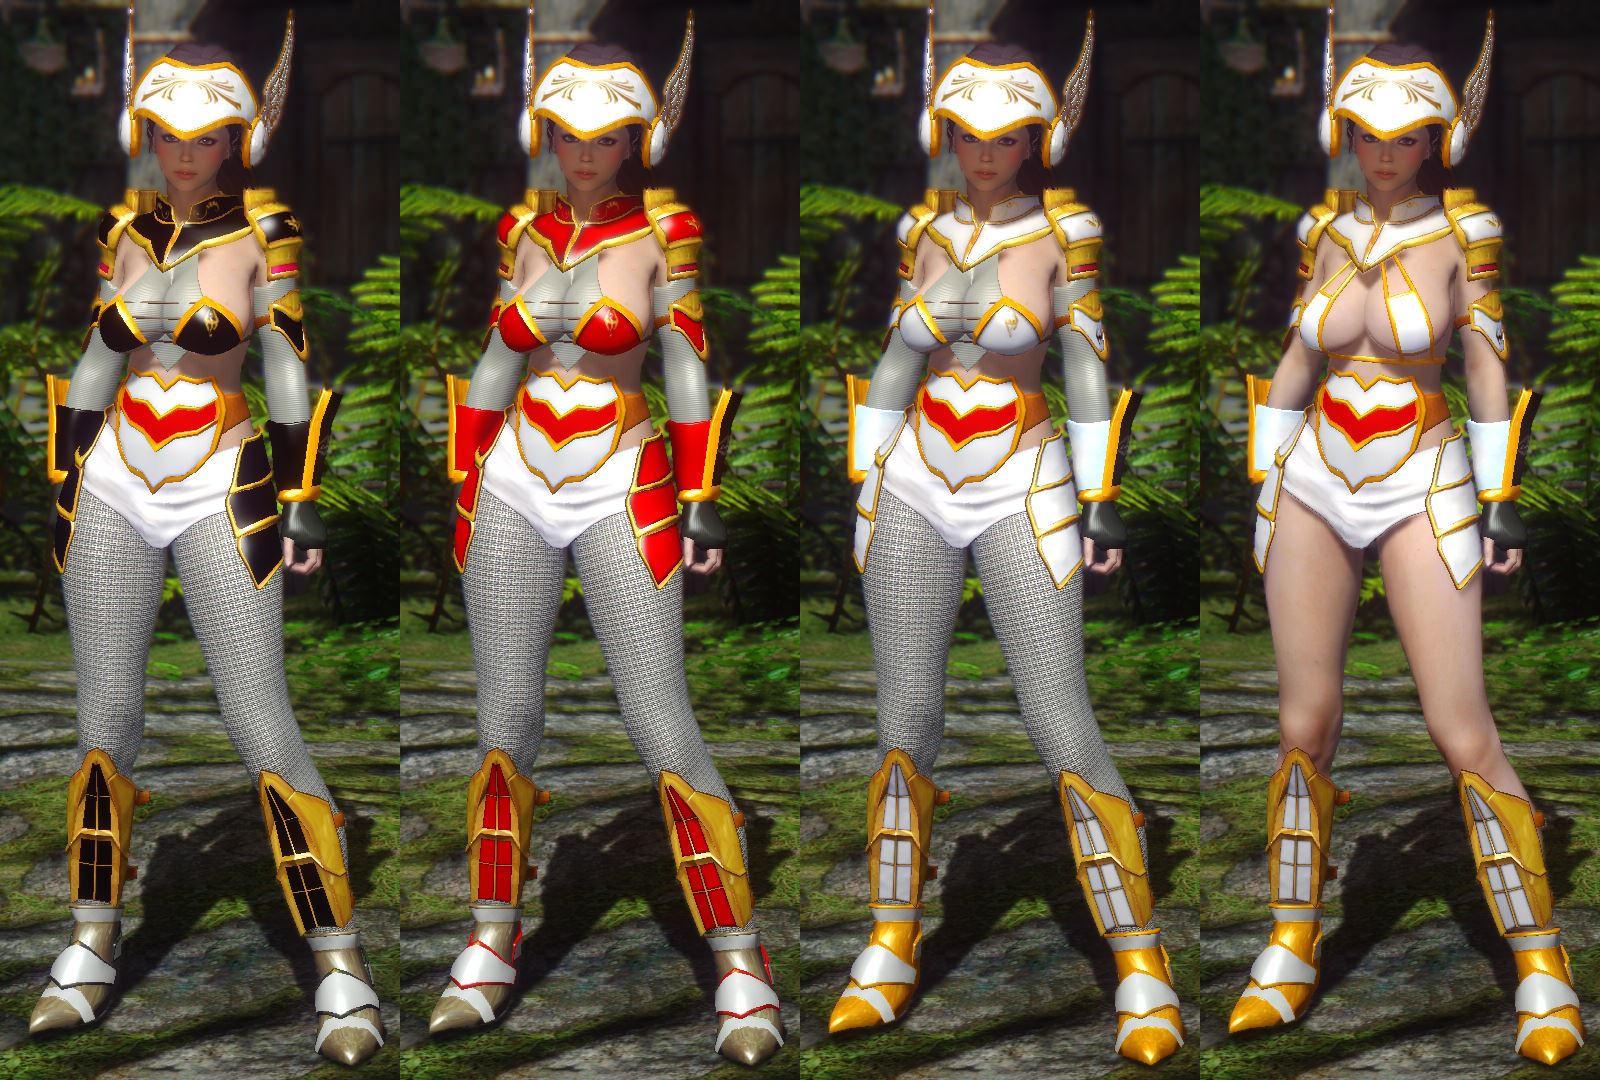 Princess_Armor_Robe_Set_UNPBO_6.jpg